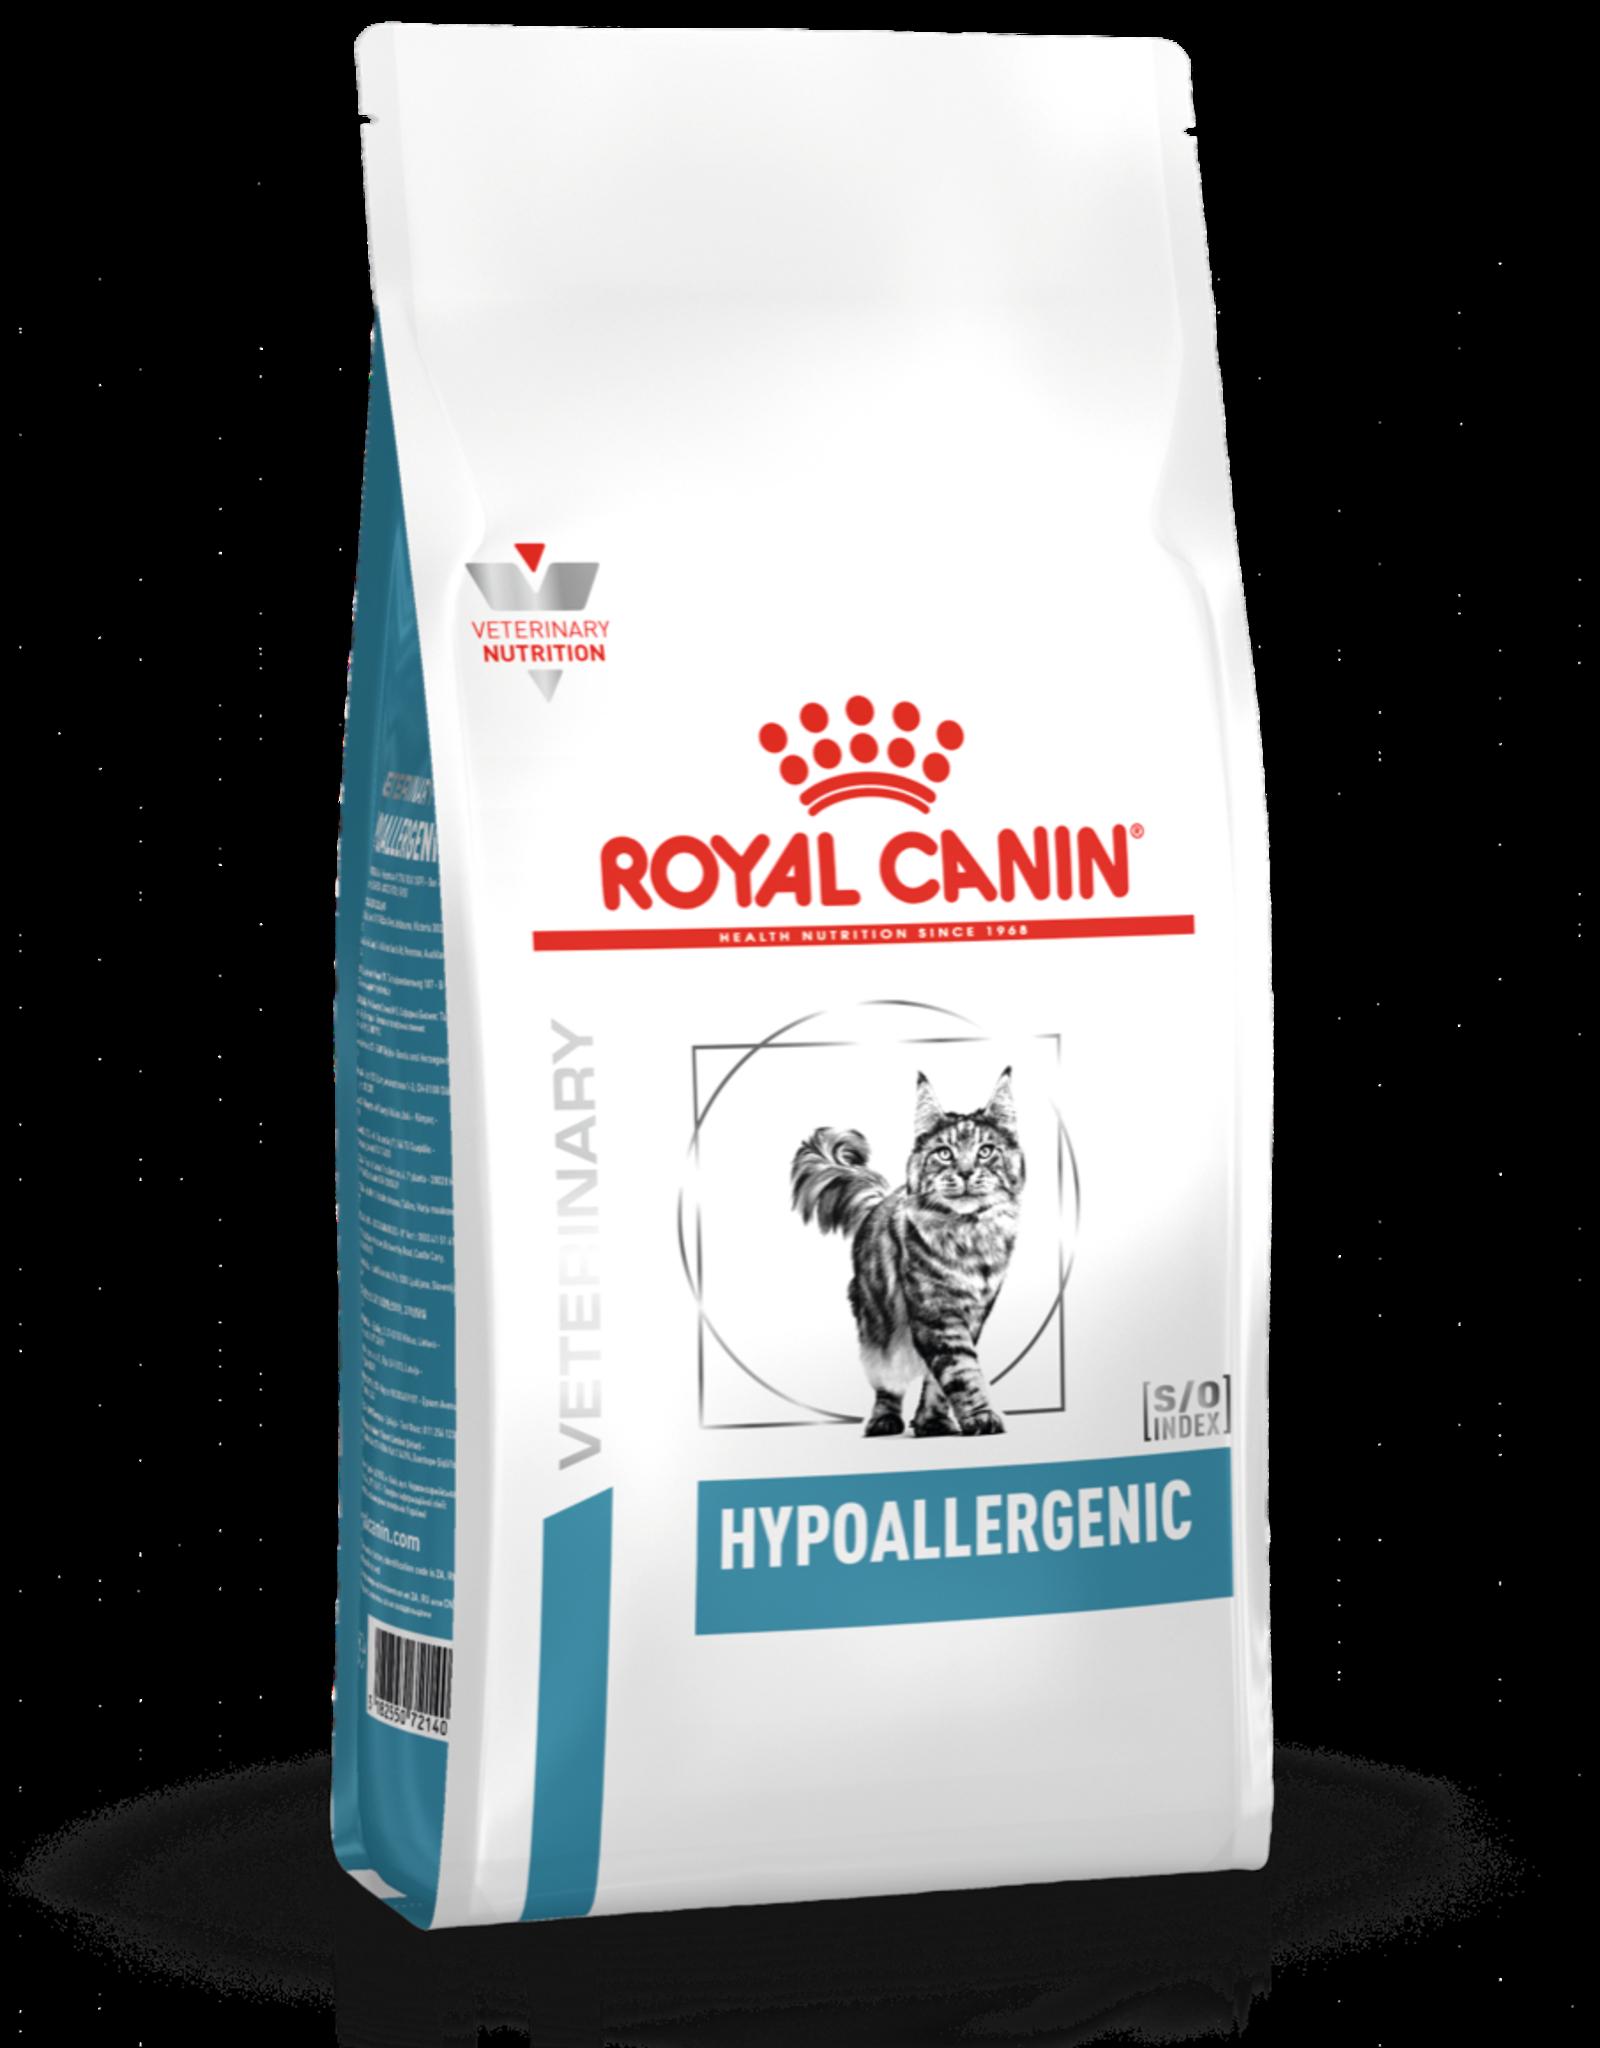 Royal Canin Royal Canin Hypoallergenic Kat 2,5kg